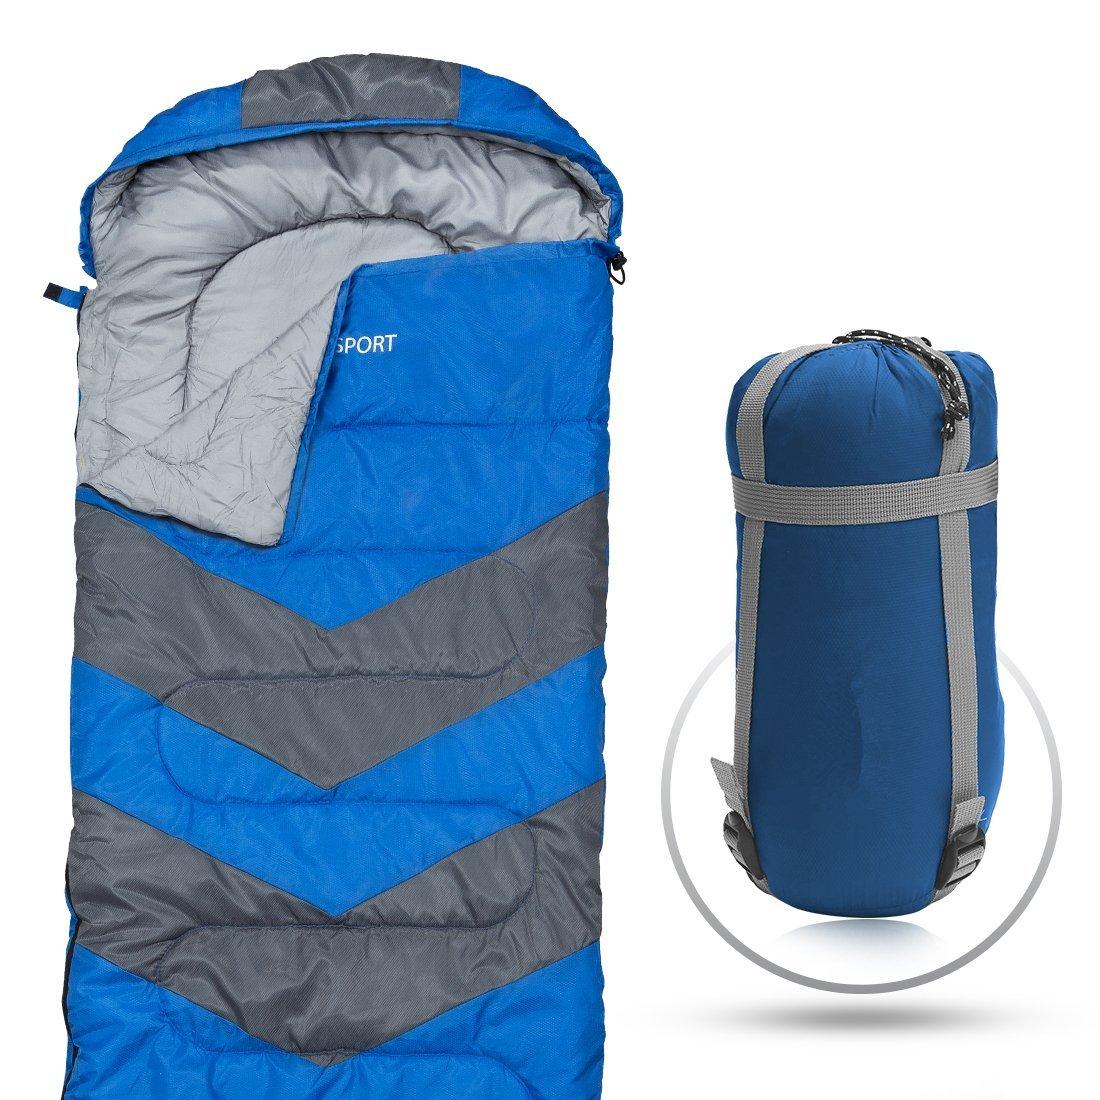 Sleeping Bag Emergency